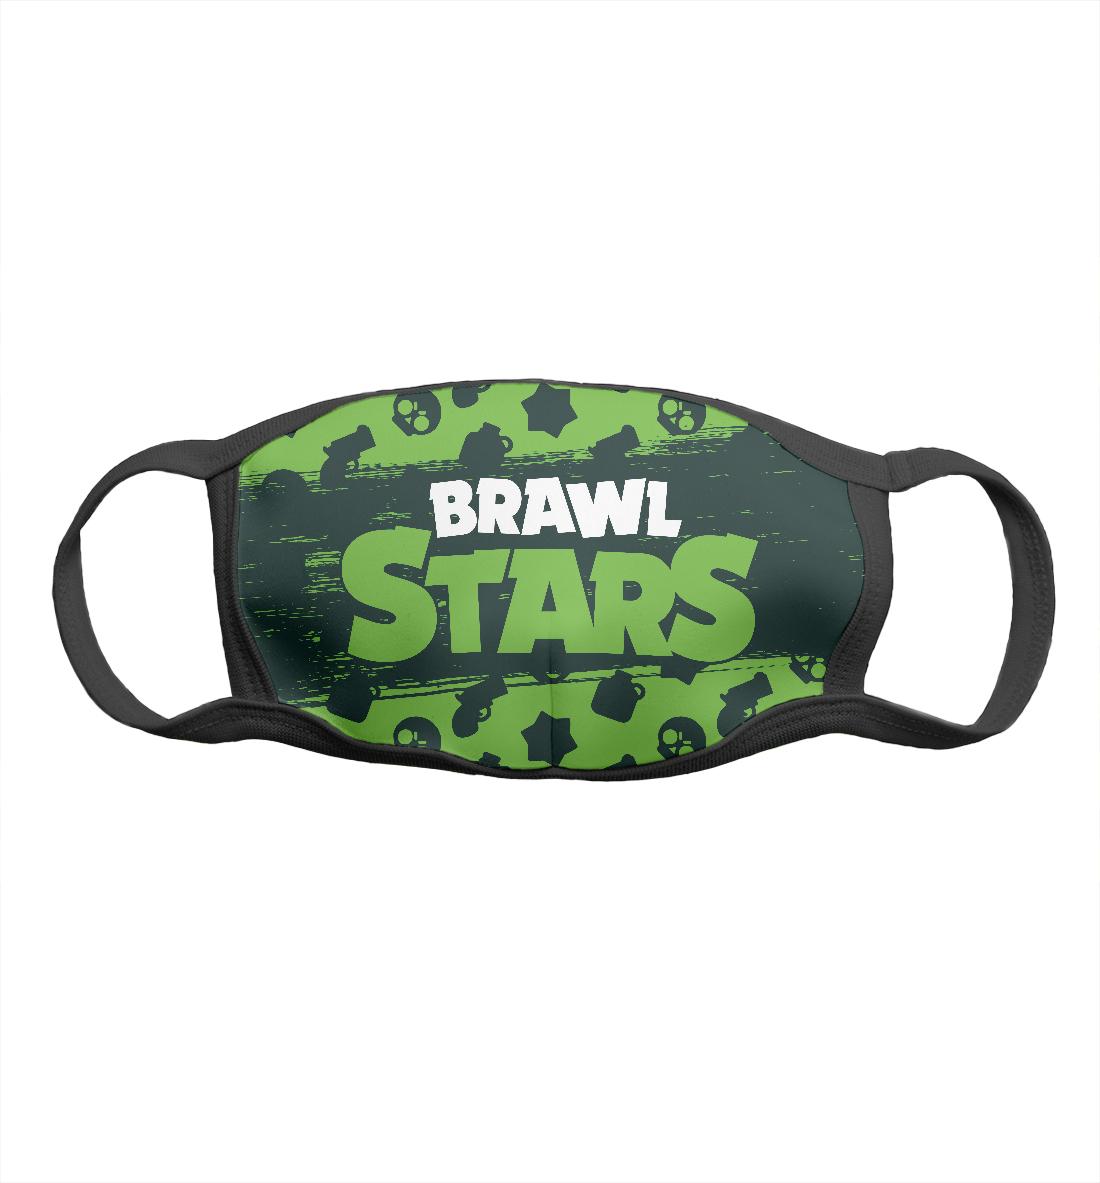 Brawl Stars / Бравл Старс бравл старс одежда